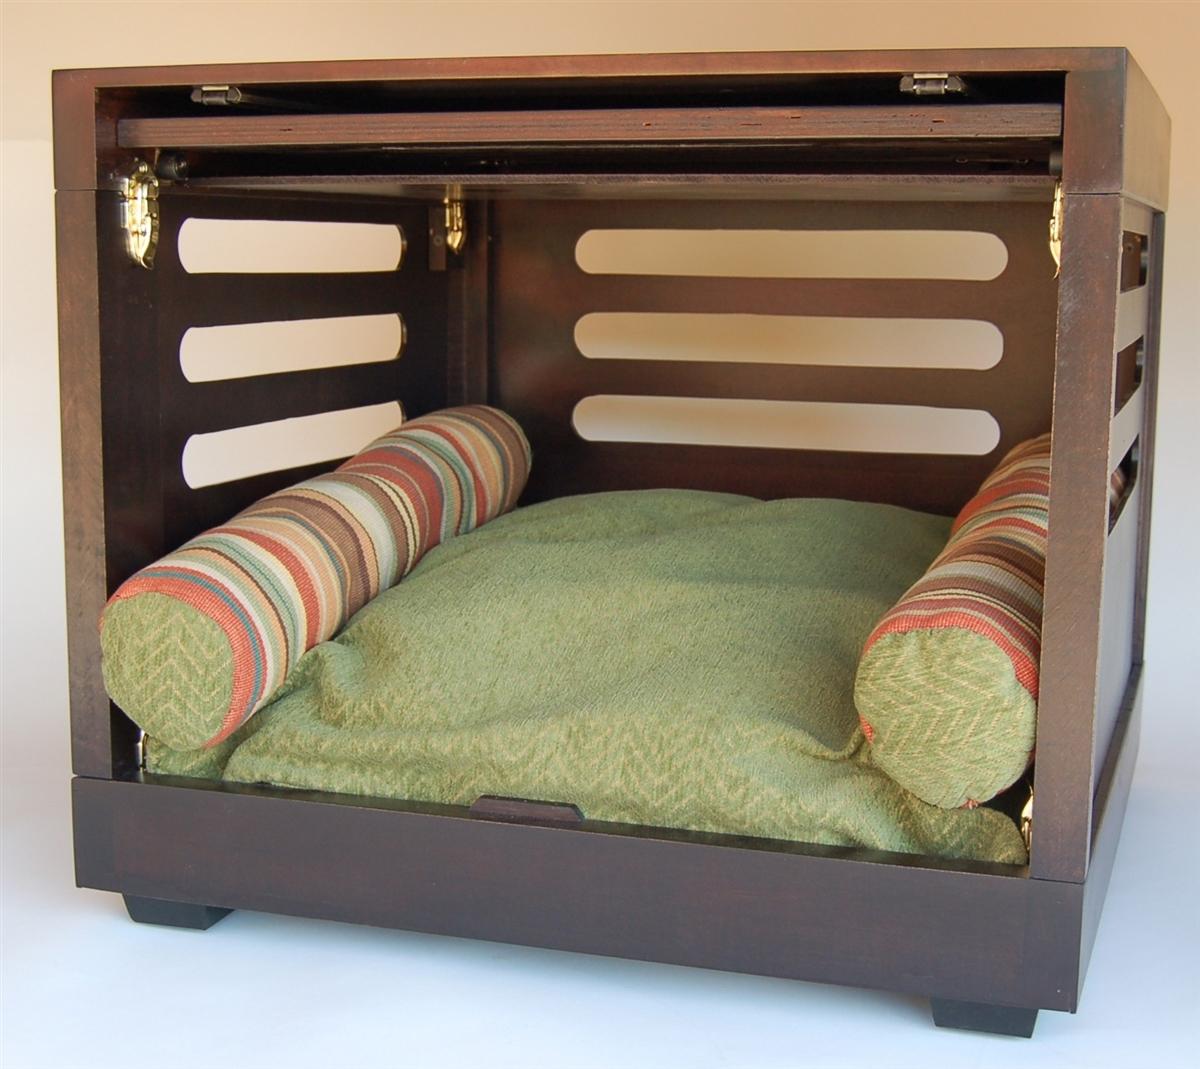 designer dog crate  custom dog crate  luxury dog furniture - designer dog crate